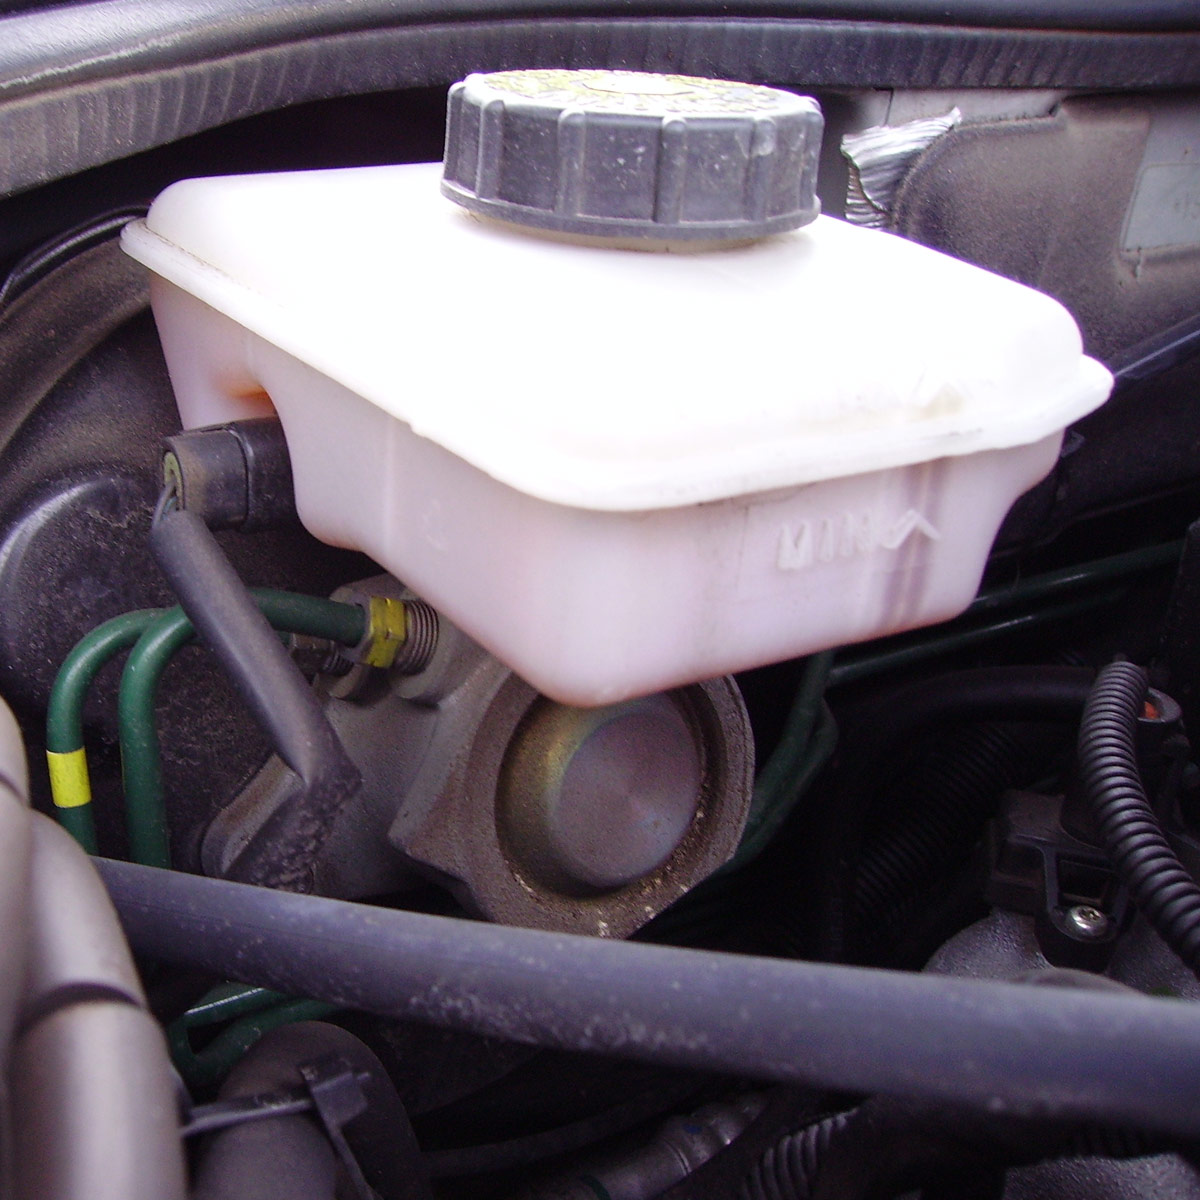 Brake Master Cylinder Replacement Costs Repairs Autoguru 1989 Subaru Gl Fuel Filter Location